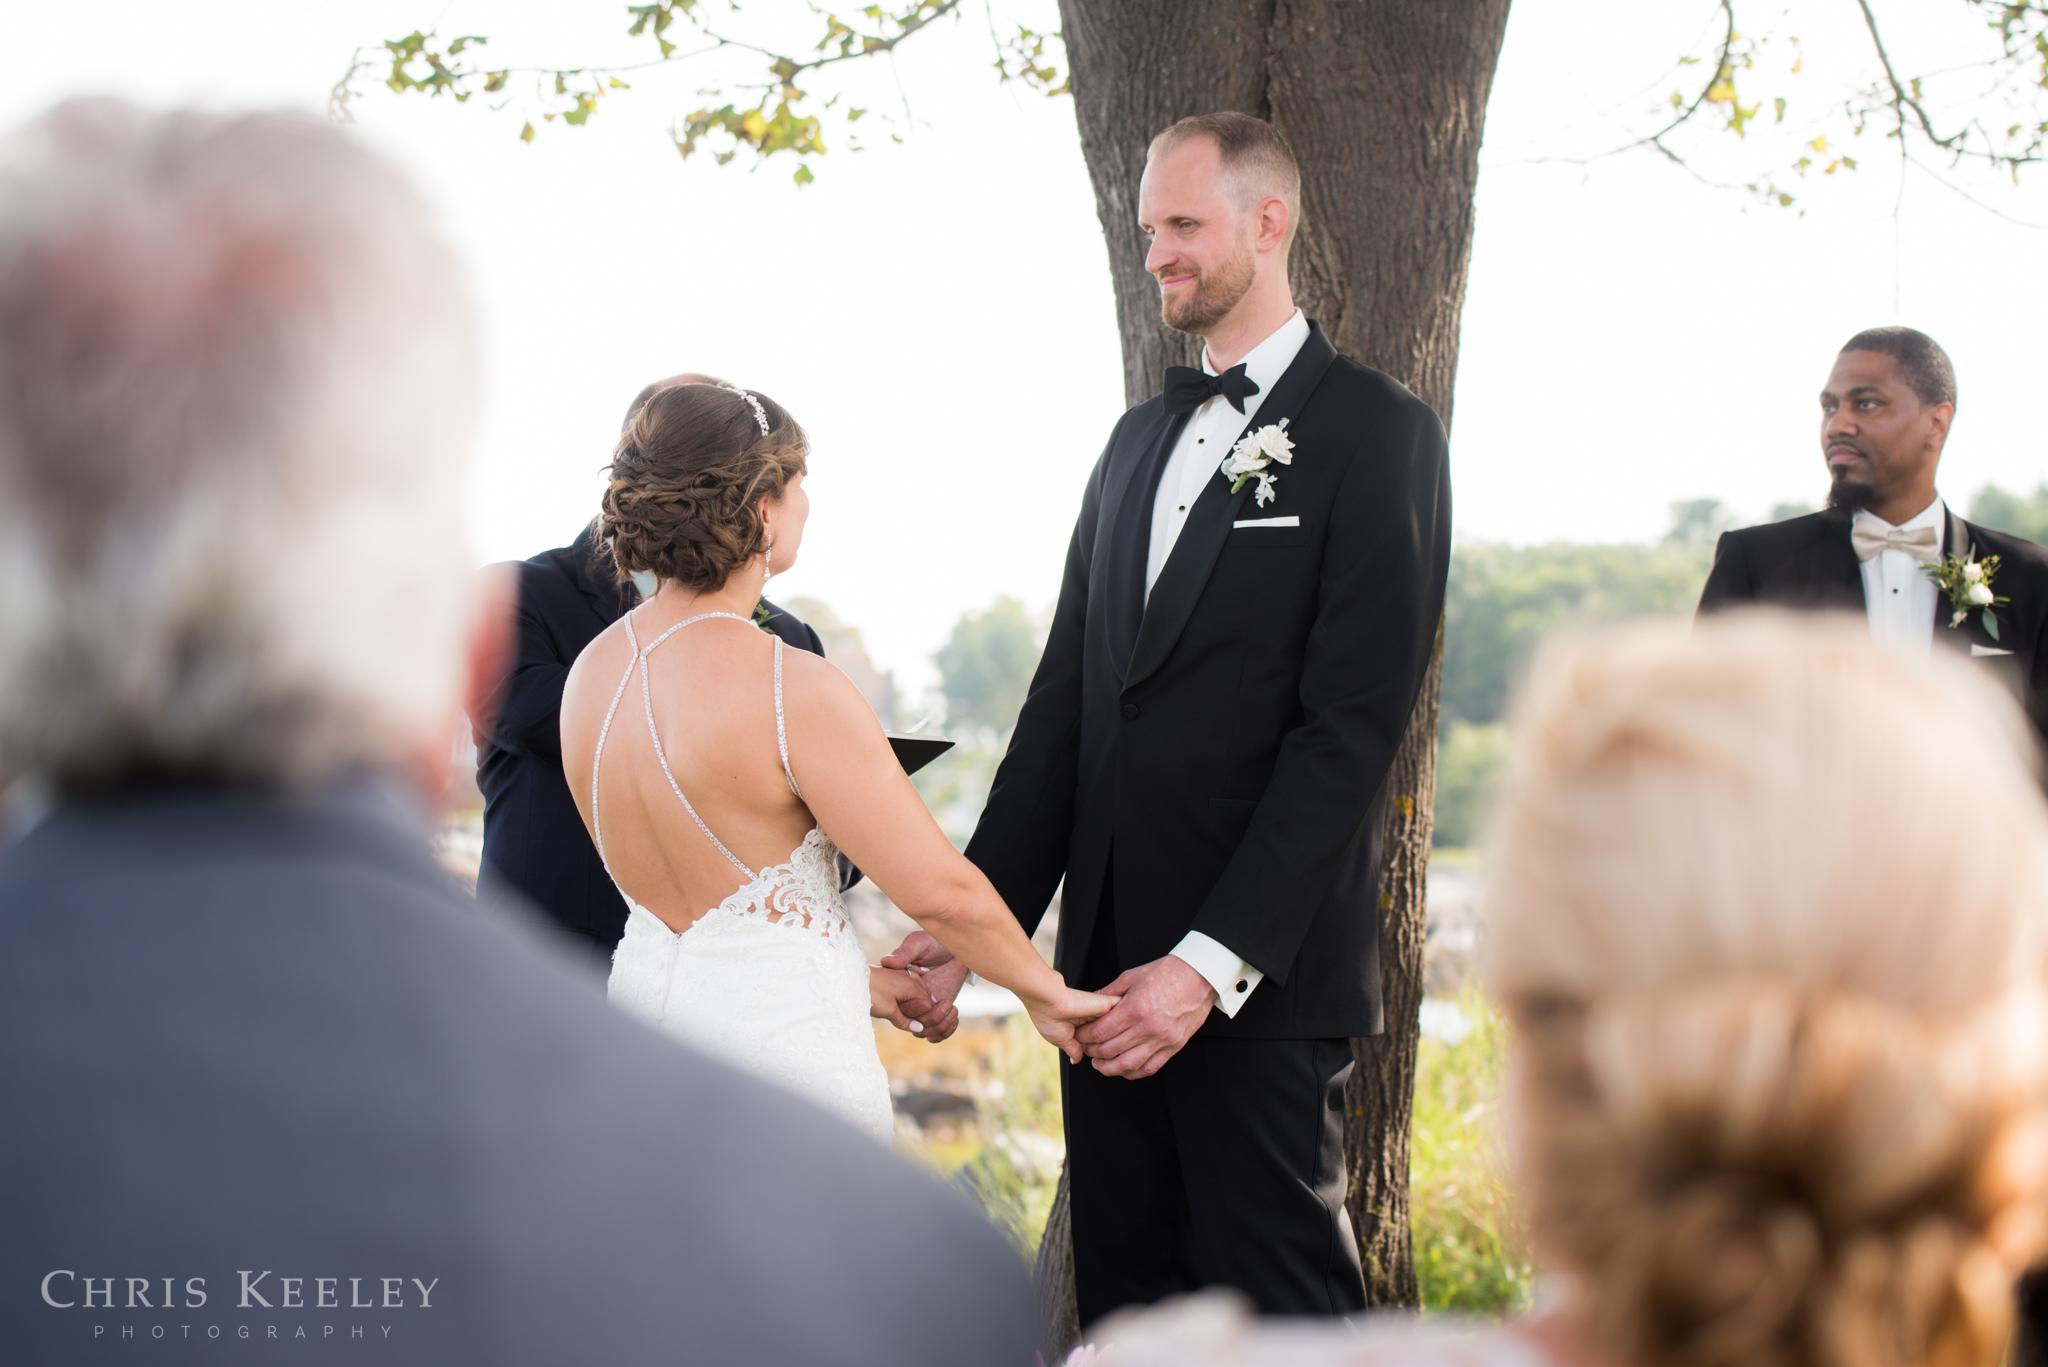 mombo-portsmouth-new-hampshire-wedding-photograper-35.jpg